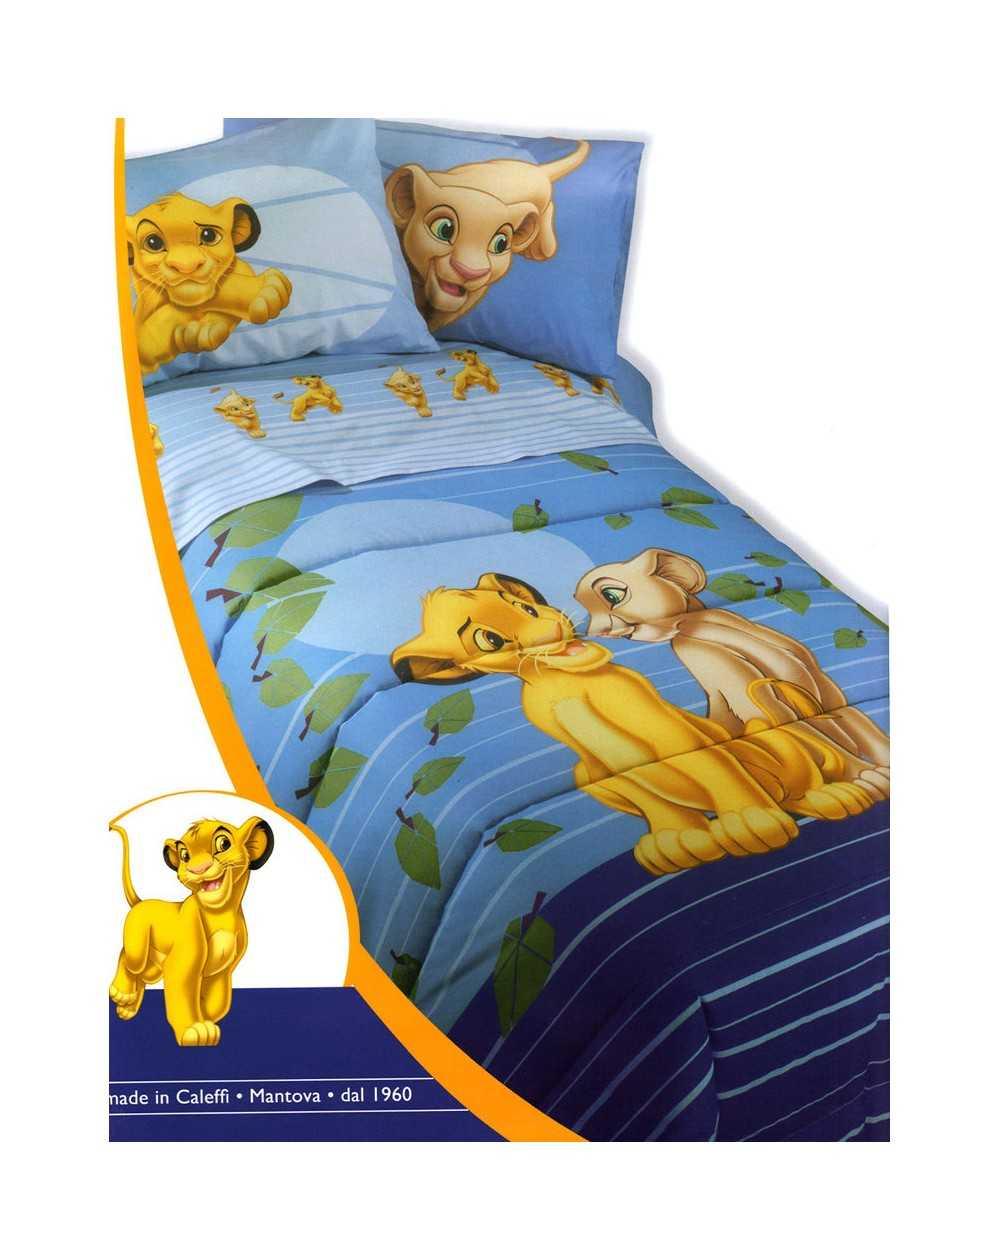 Comforter SINGLE BED Simba DISNEY